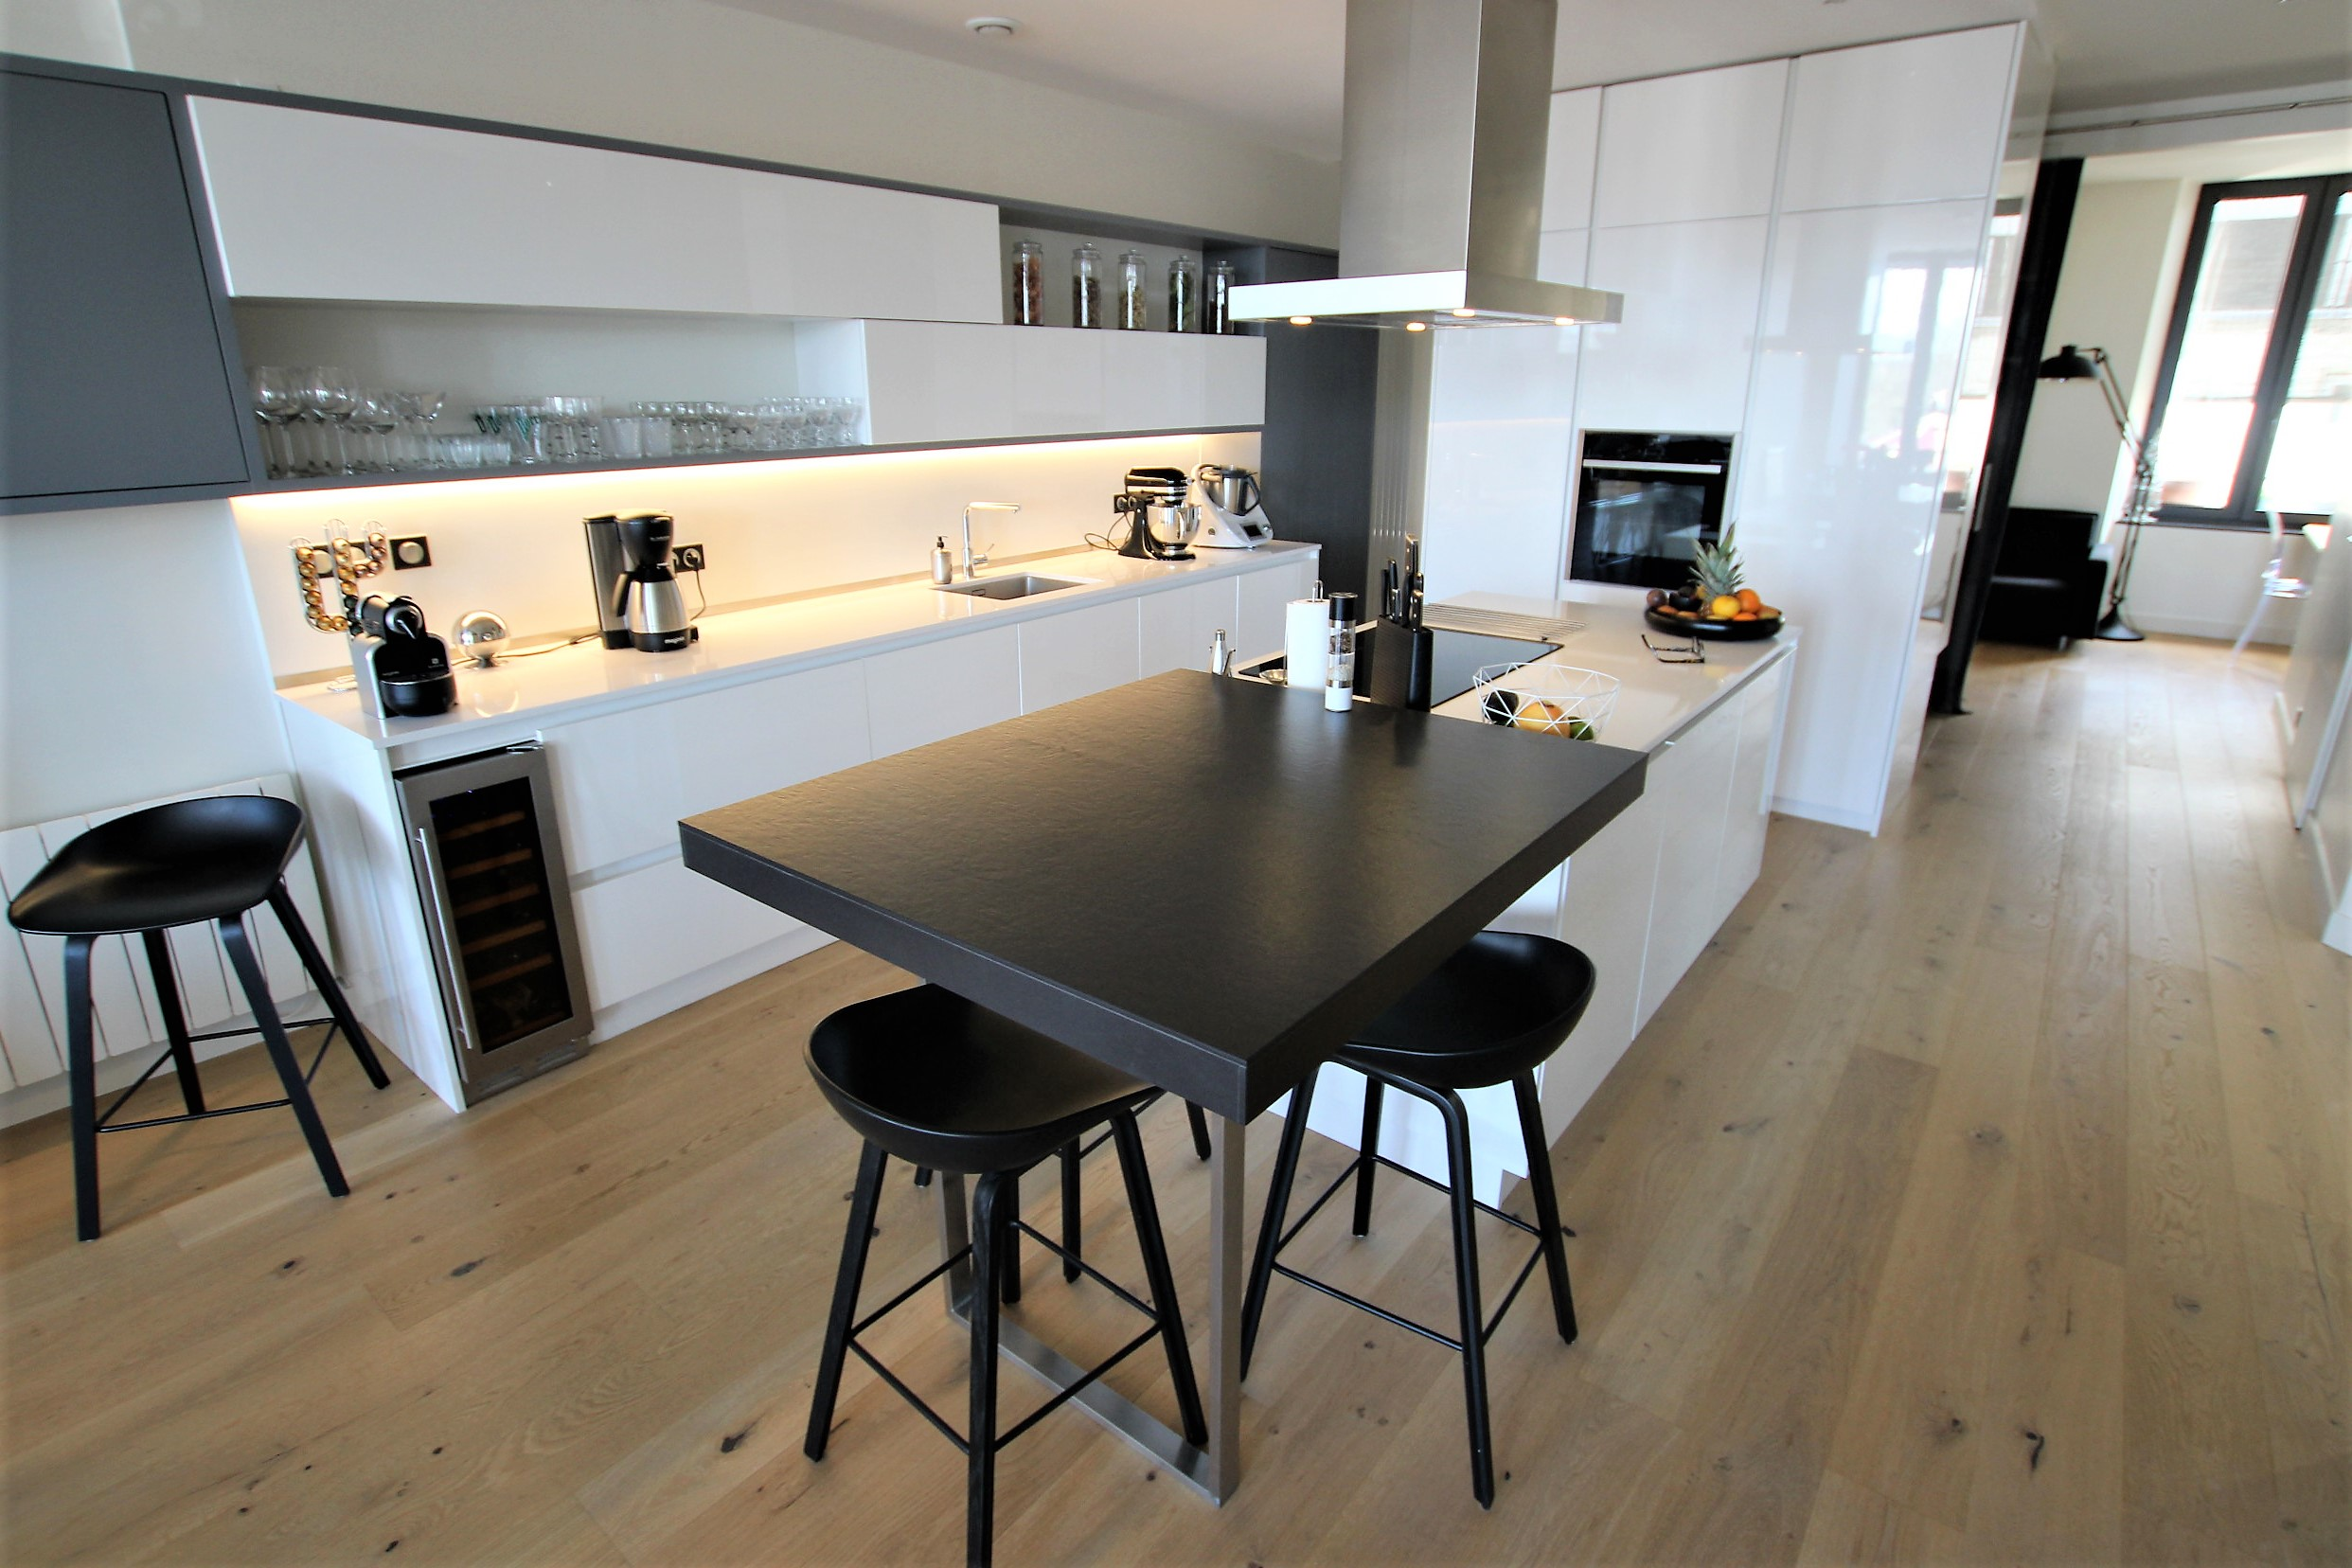 achat appartement tr s bel appartement centre ville. Black Bedroom Furniture Sets. Home Design Ideas